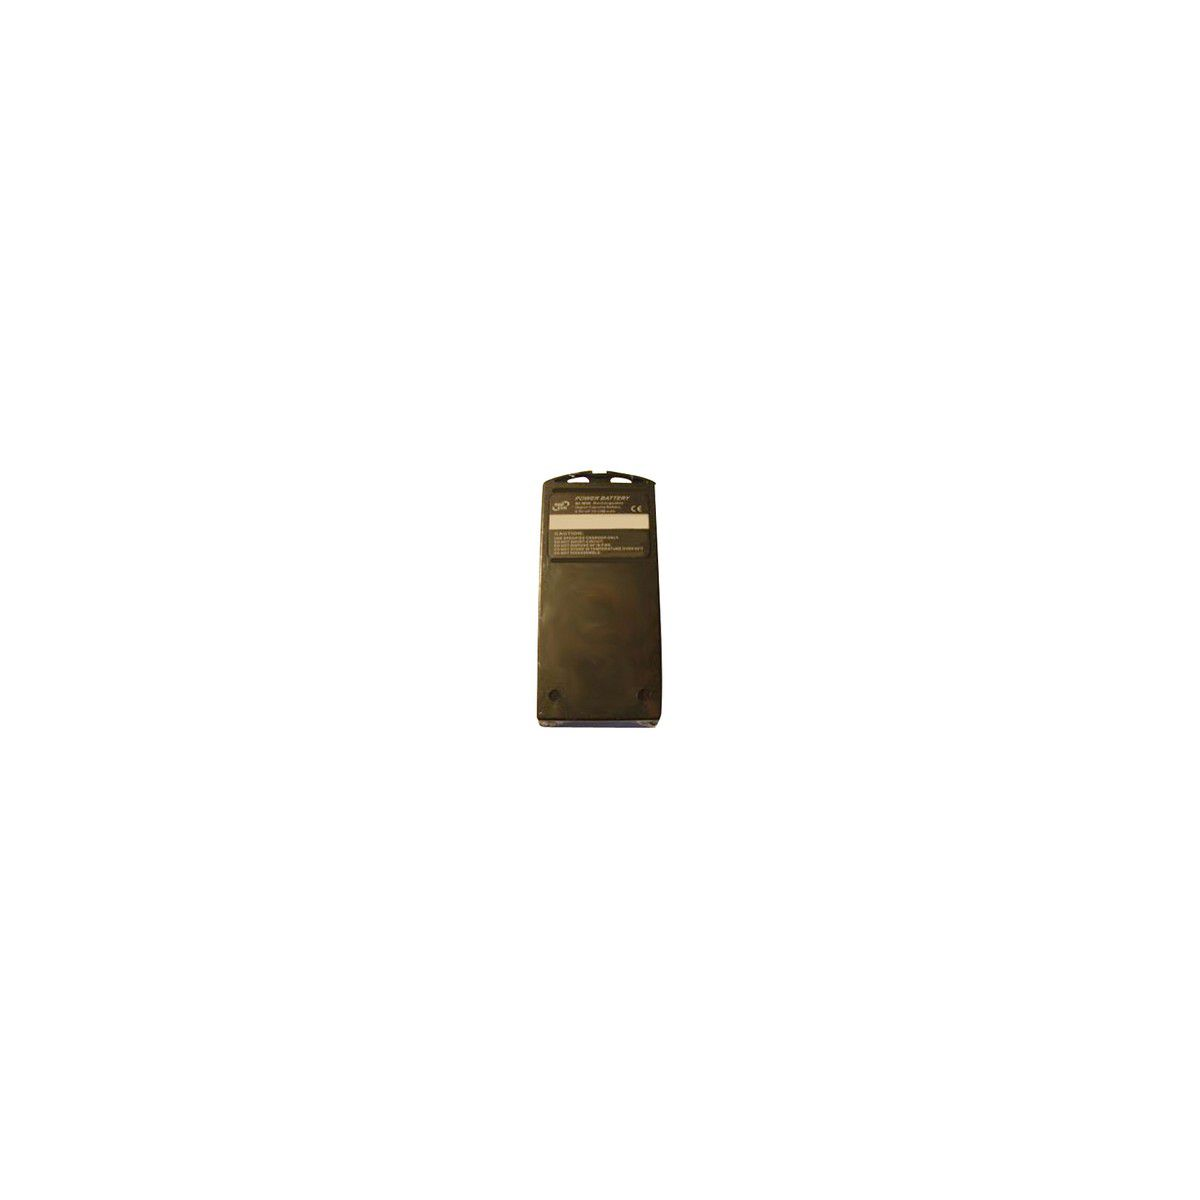 Batterie portable ENERGY Nokia 3210 (photo)